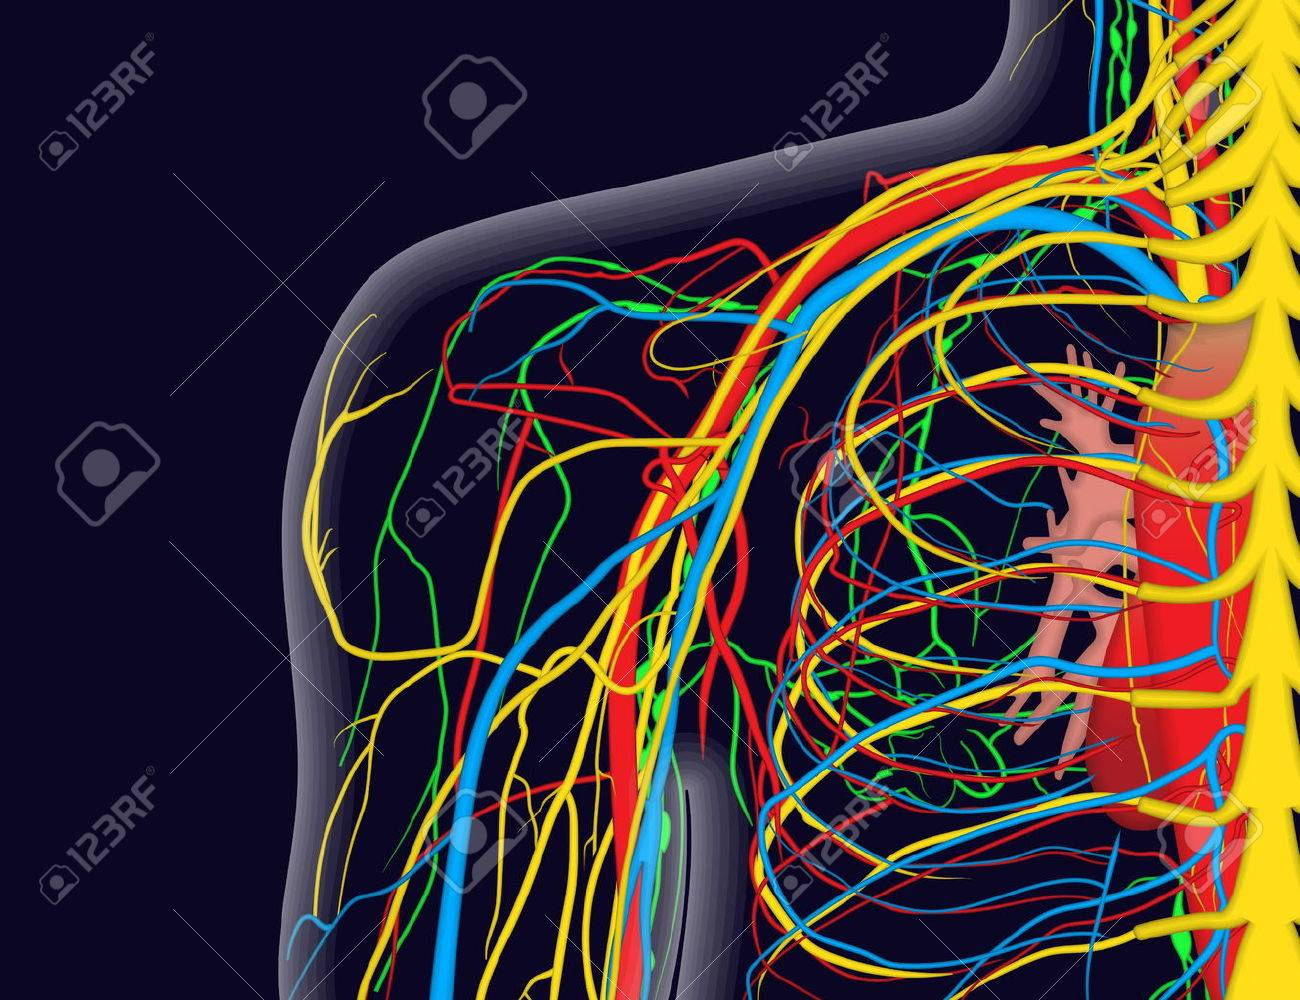 Medical Vector Illustration Of The Shoulder Anatomy With Nerves ...